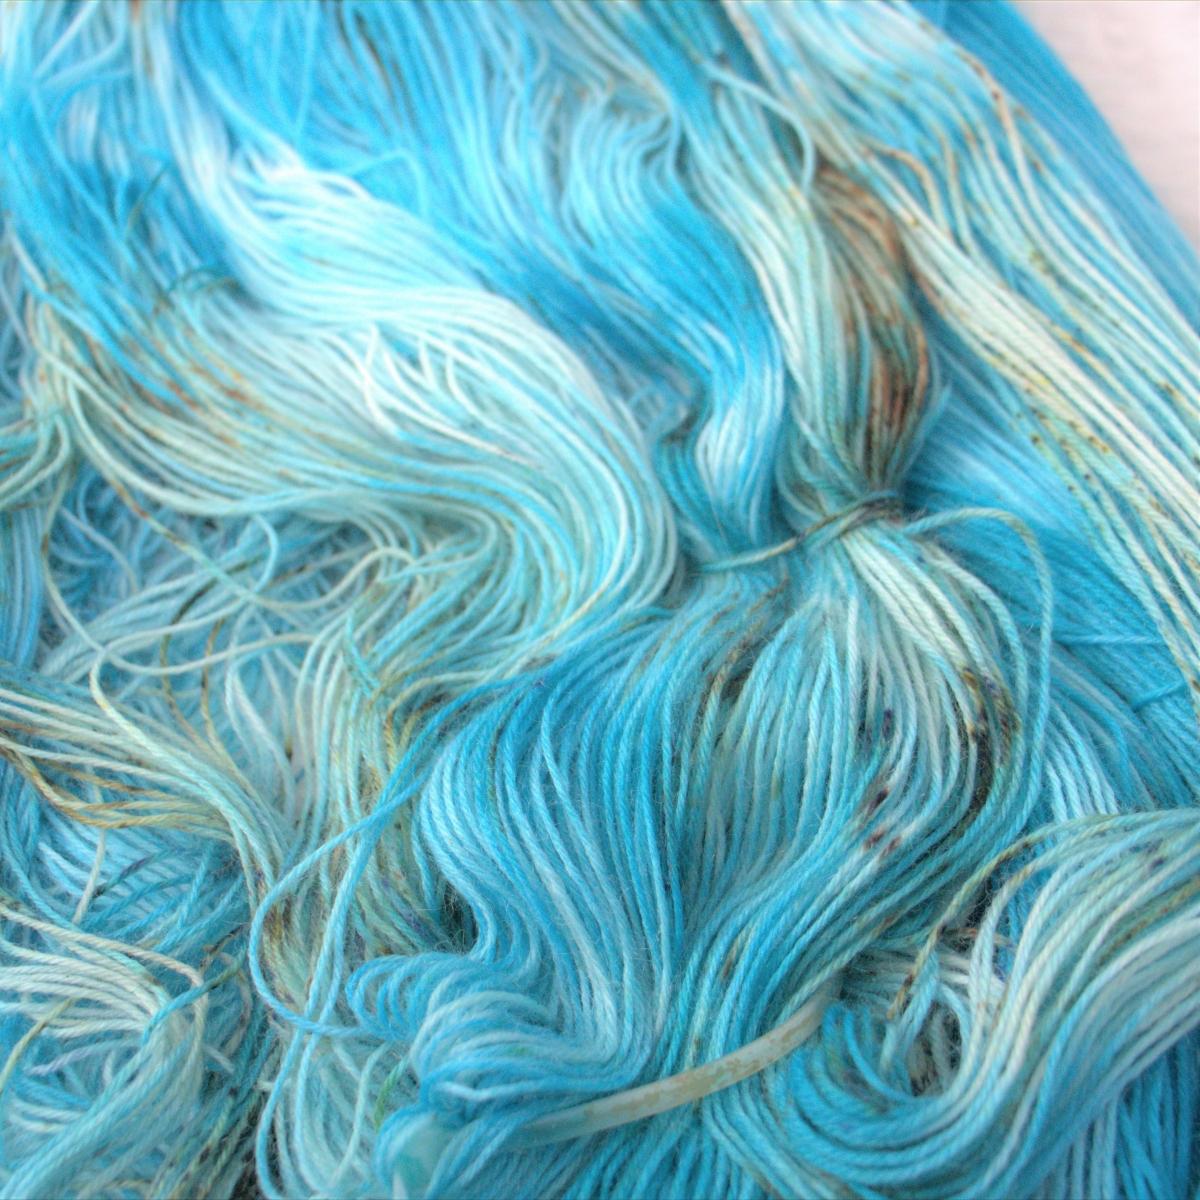 woodico.pro hand dyed yarn 049 copy 1200x1200 - Hand dyed yarn / 050